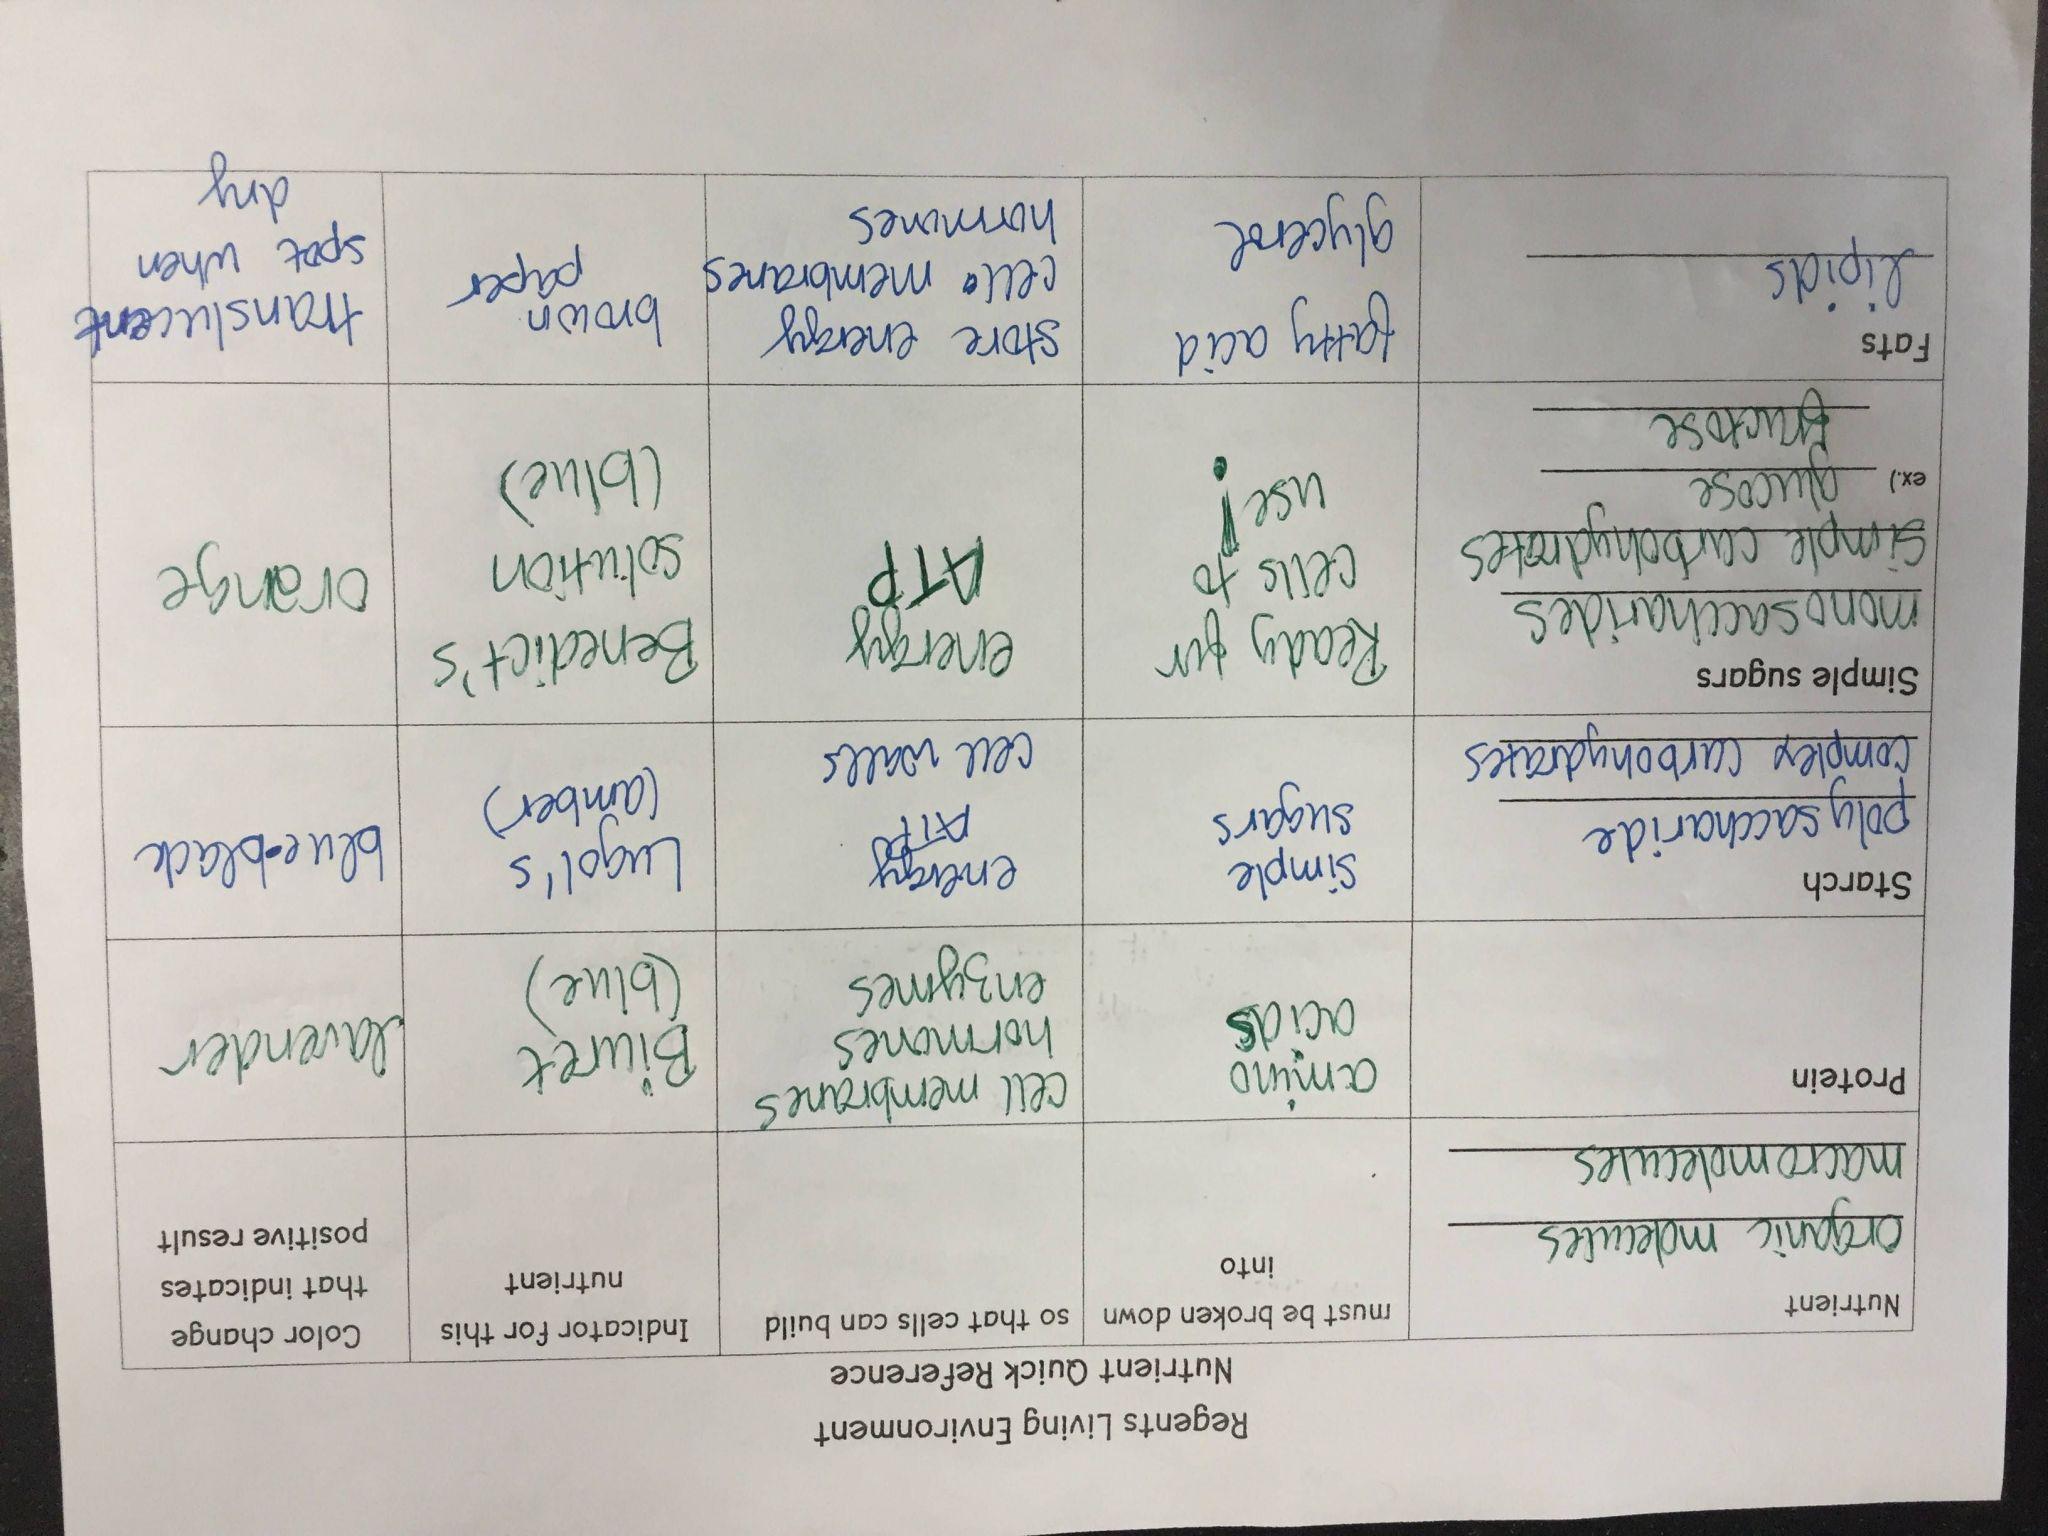 Virtual Lab Dna And Genes Worksheet